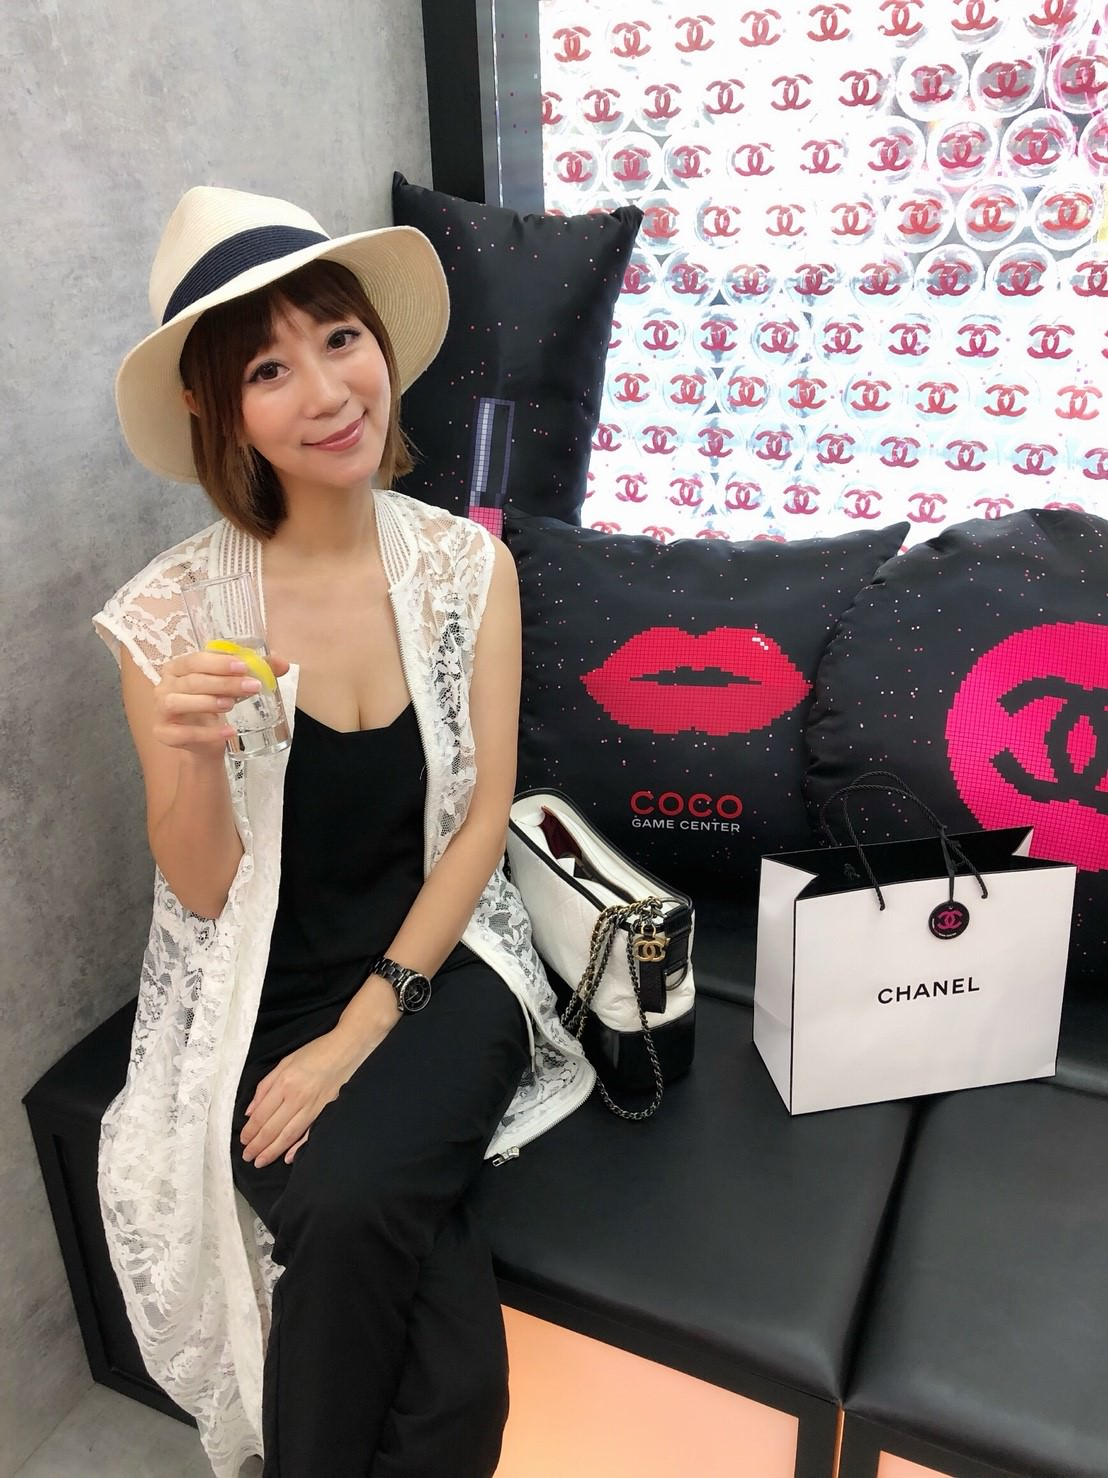 2018時尚IT BAG❤️【CHANEL】Gabrielle HoBo 香奈兒流浪包開箱+穿搭分享(≧∇≦)/